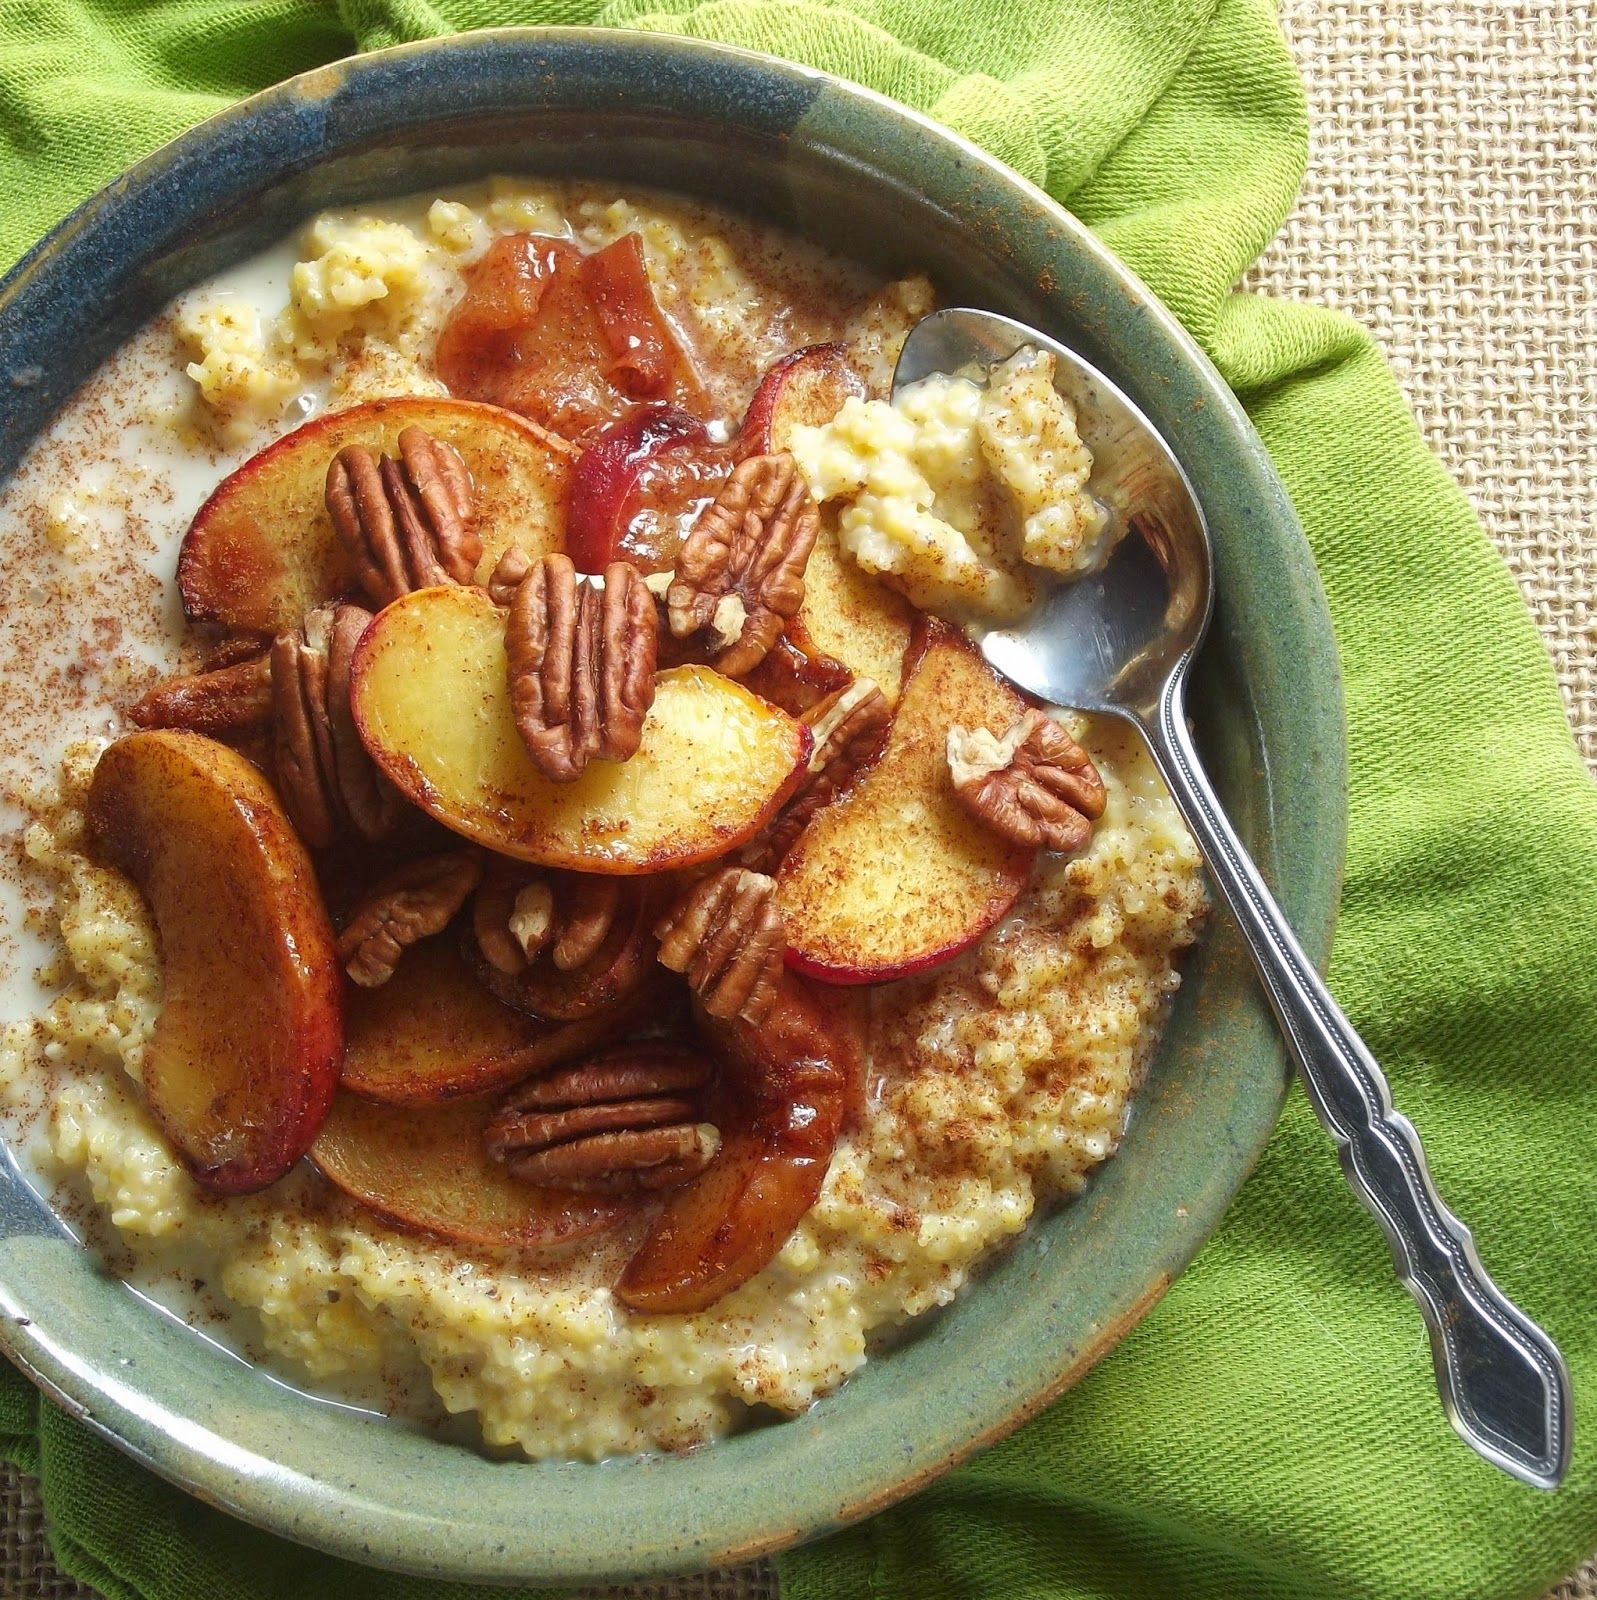 Connoisseurus Veg Roasted Peaches And Creamy Breakfast Polenta Breakfast Bowls Recipe Breakfast Bowls Recipes